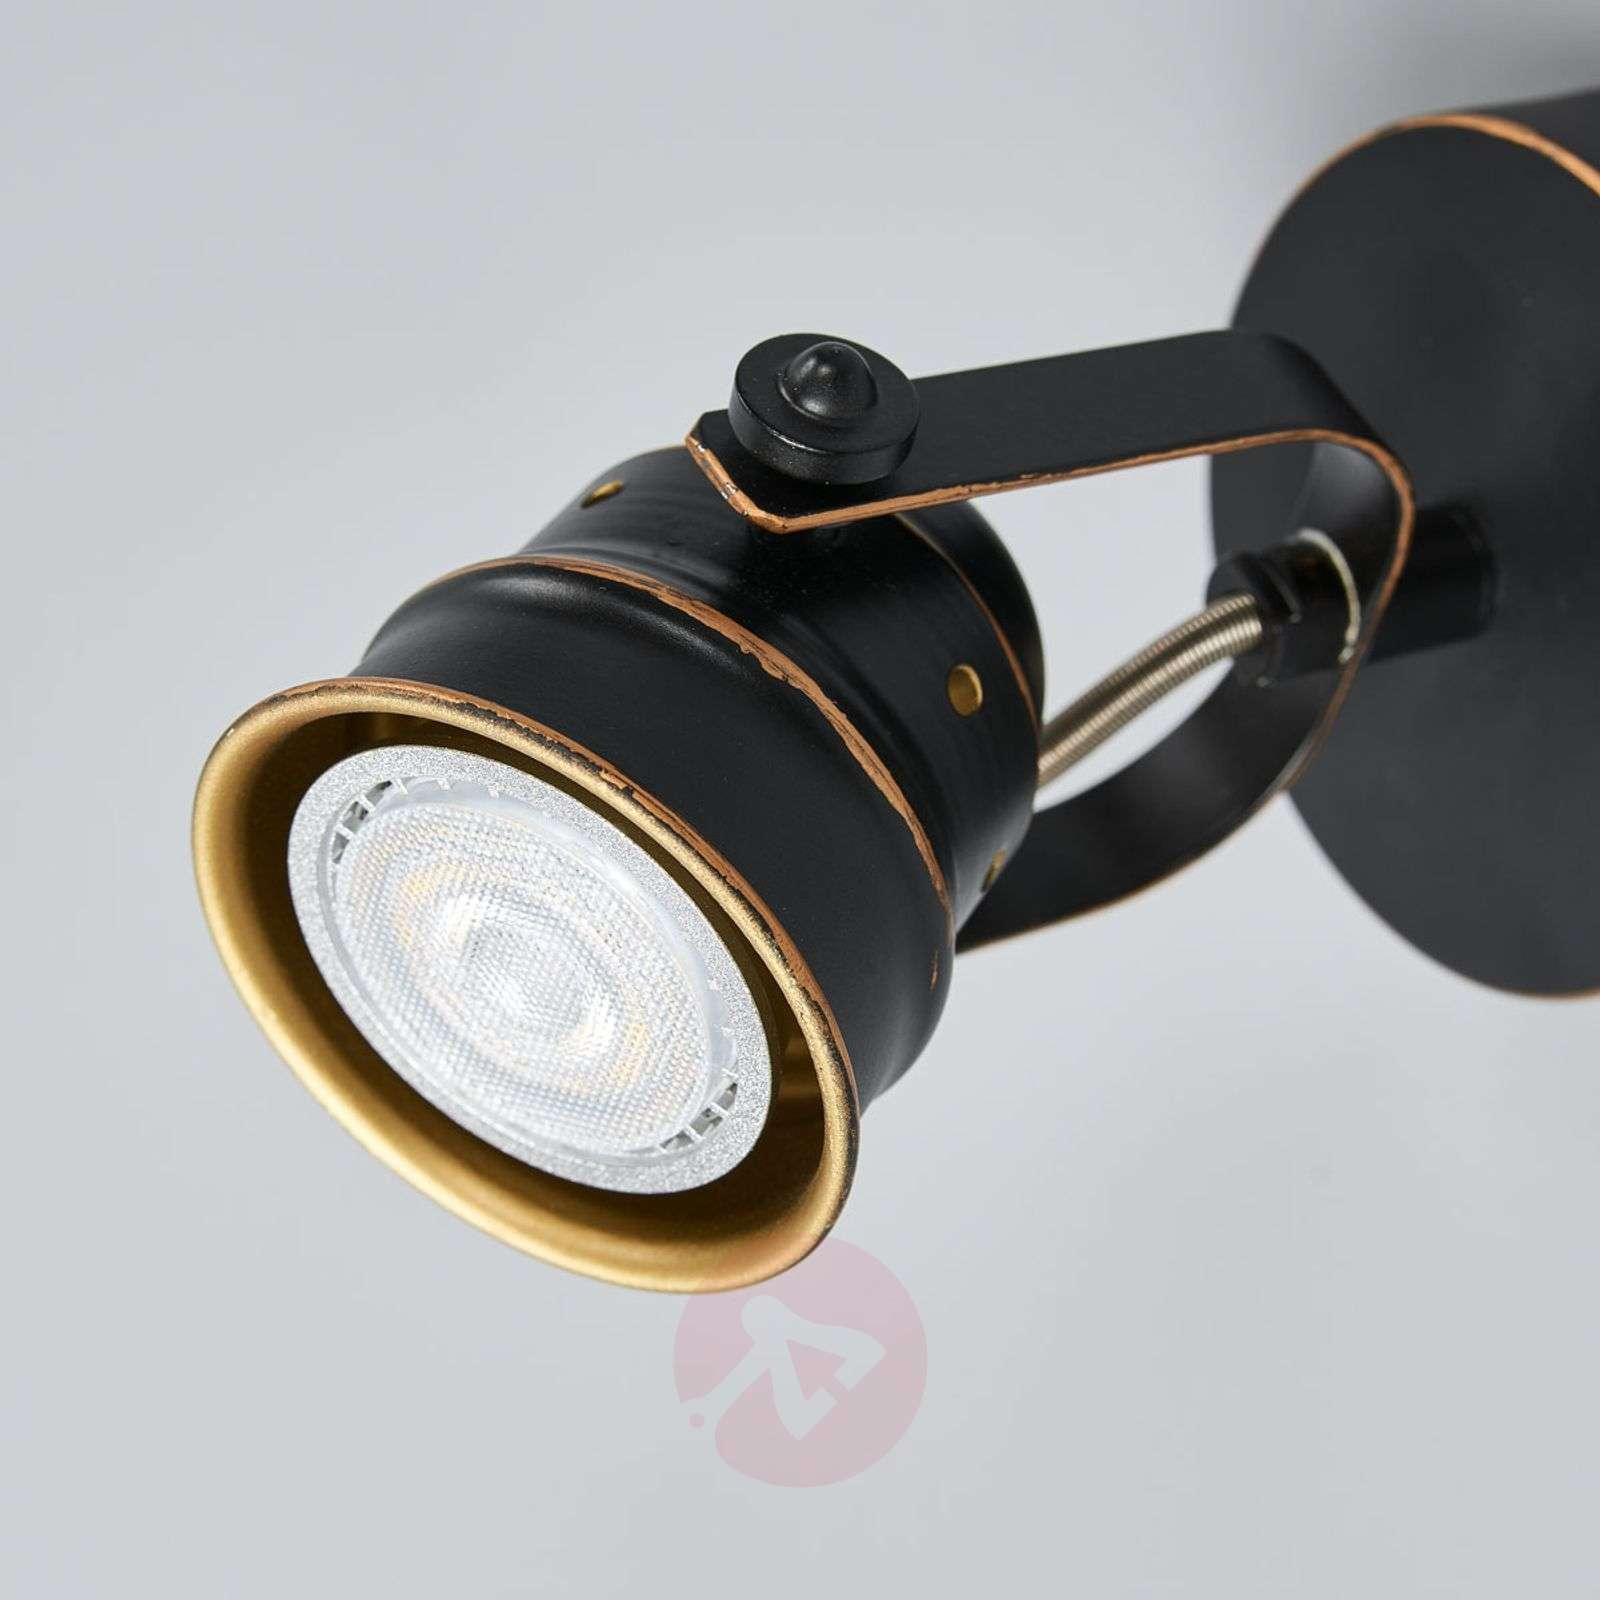 Musta-kultainen GU10-spottivalo Leonor, LED-9639066-01